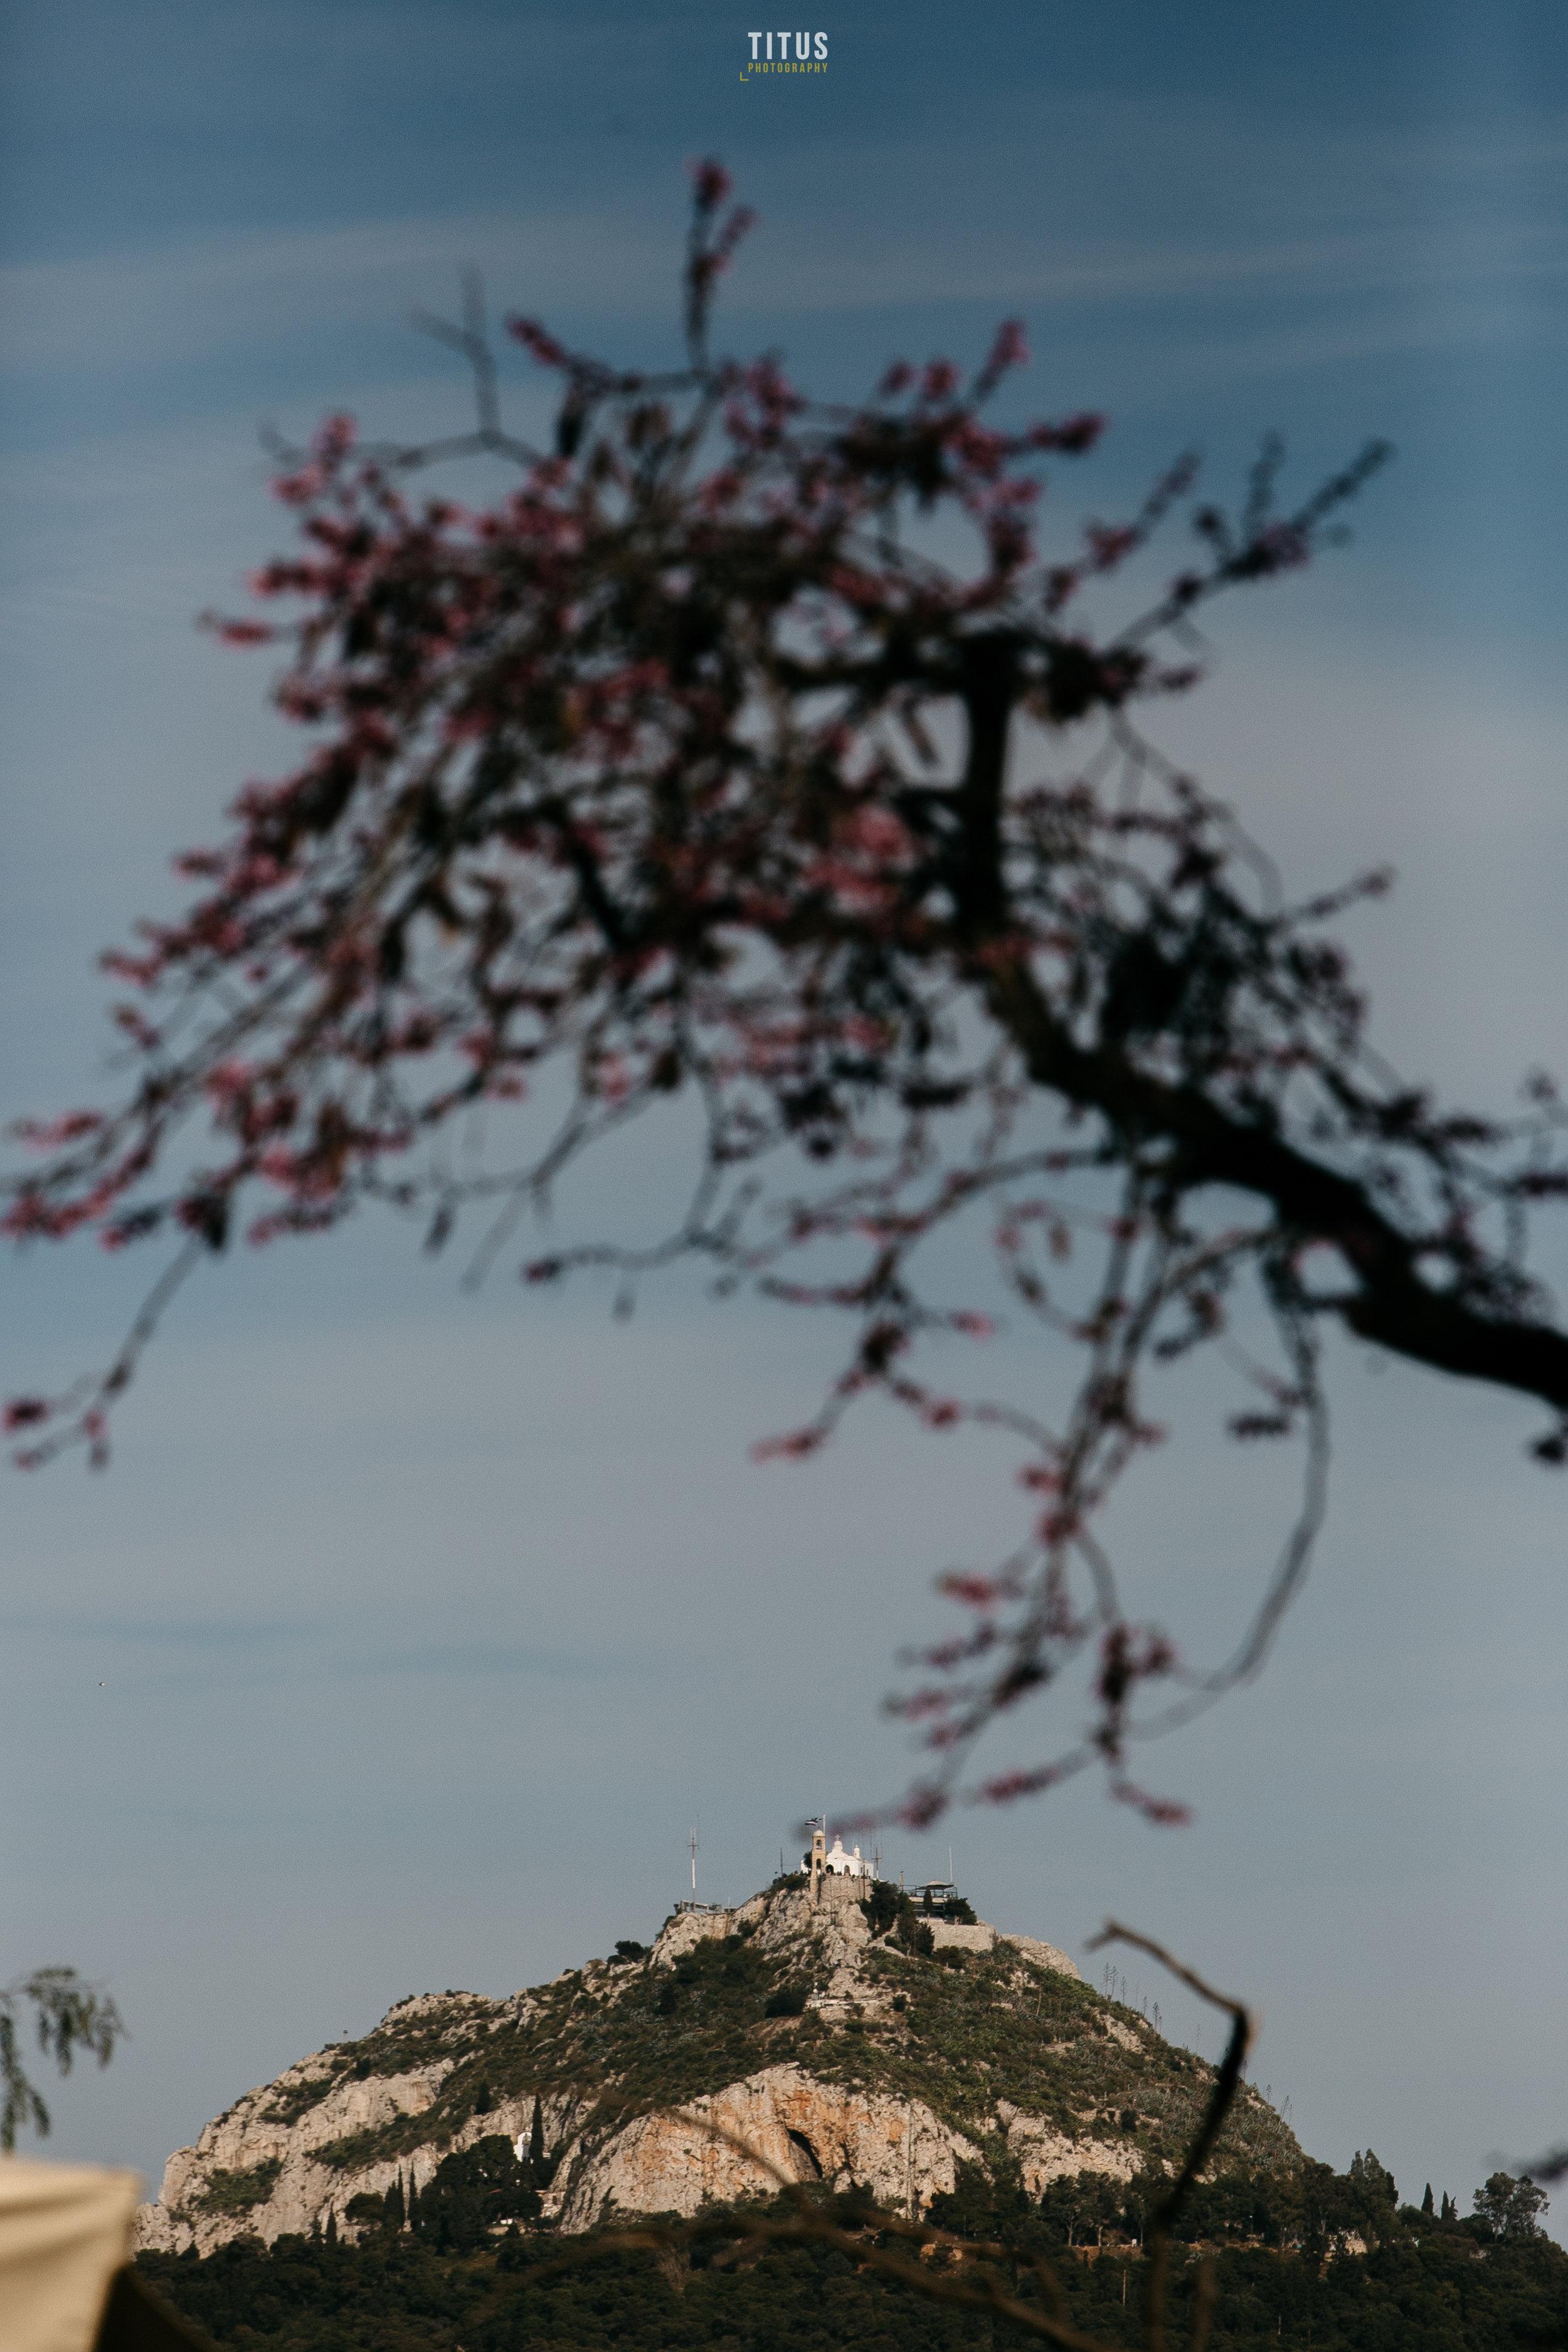 063-mons-athens-blog images.JPG